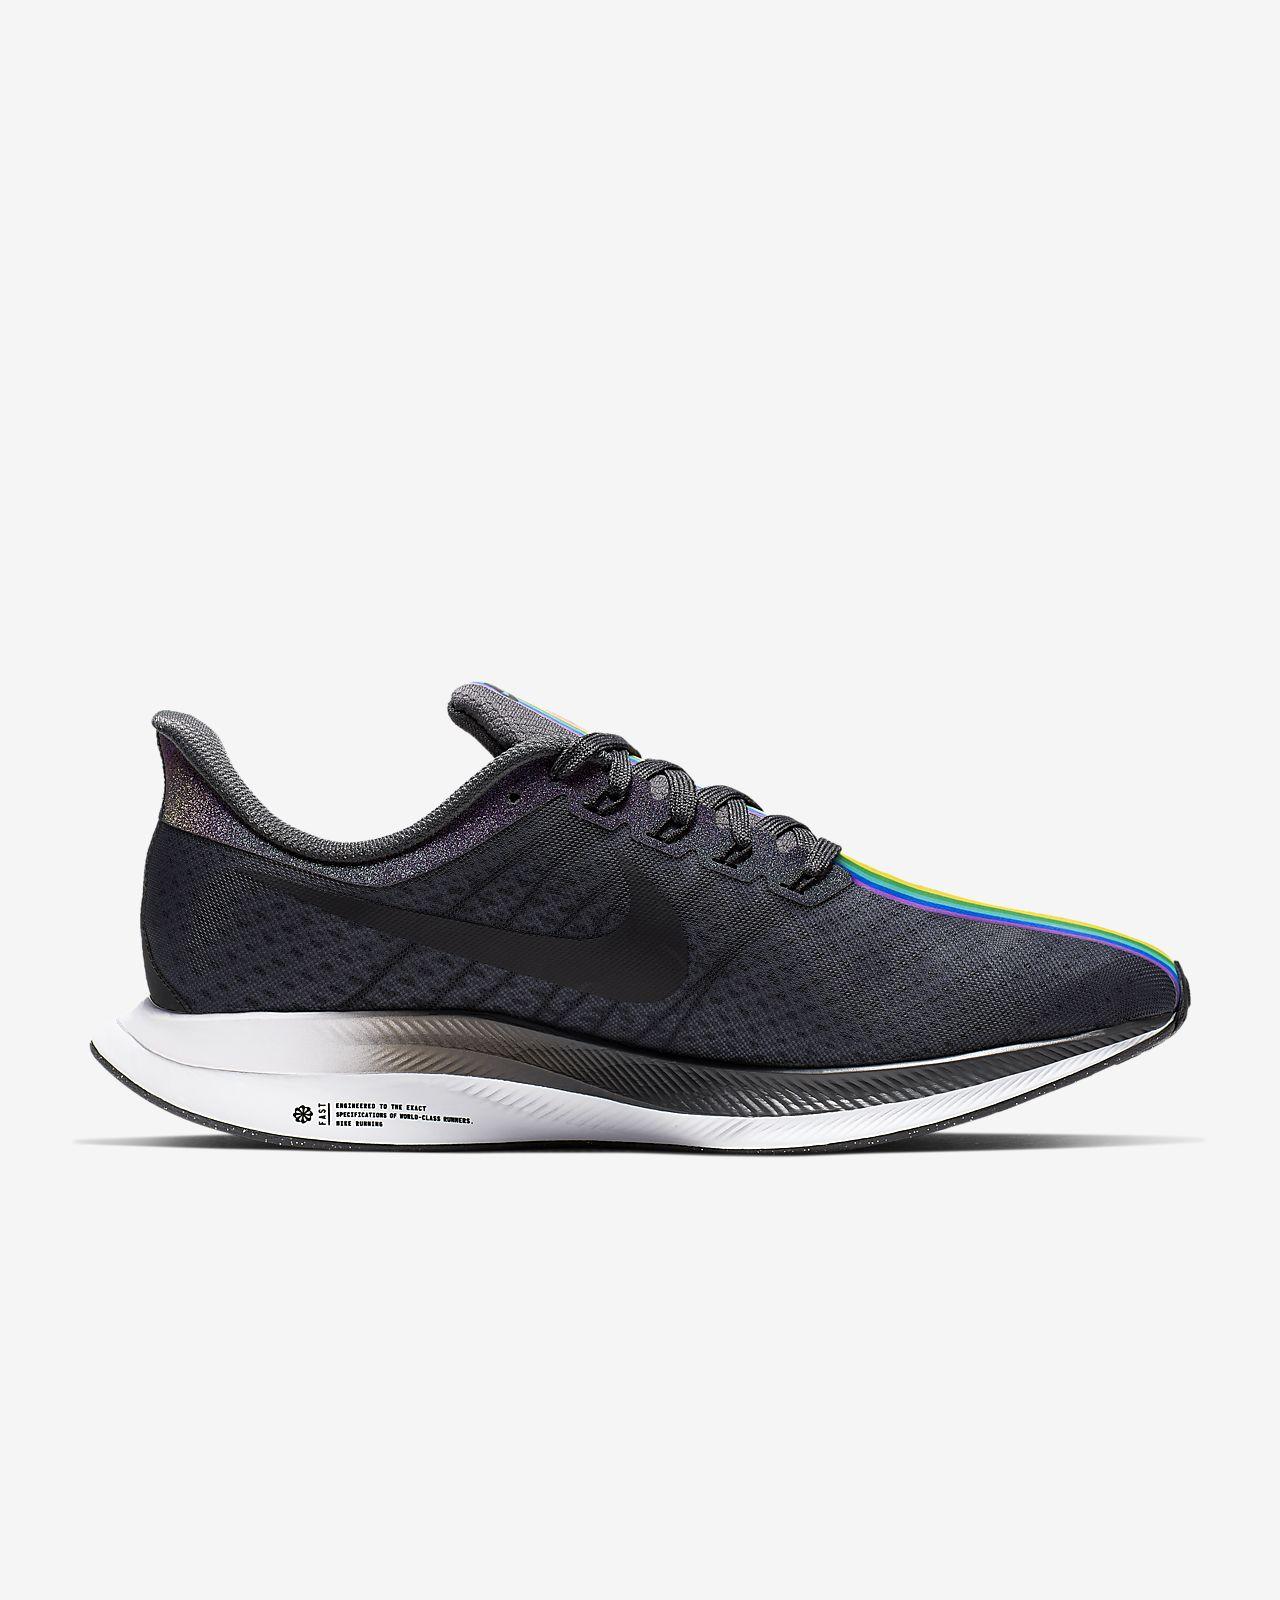 192a8665 Nike Zoom Pegasus Turbo BETRUE Running Shoe. Nike.com